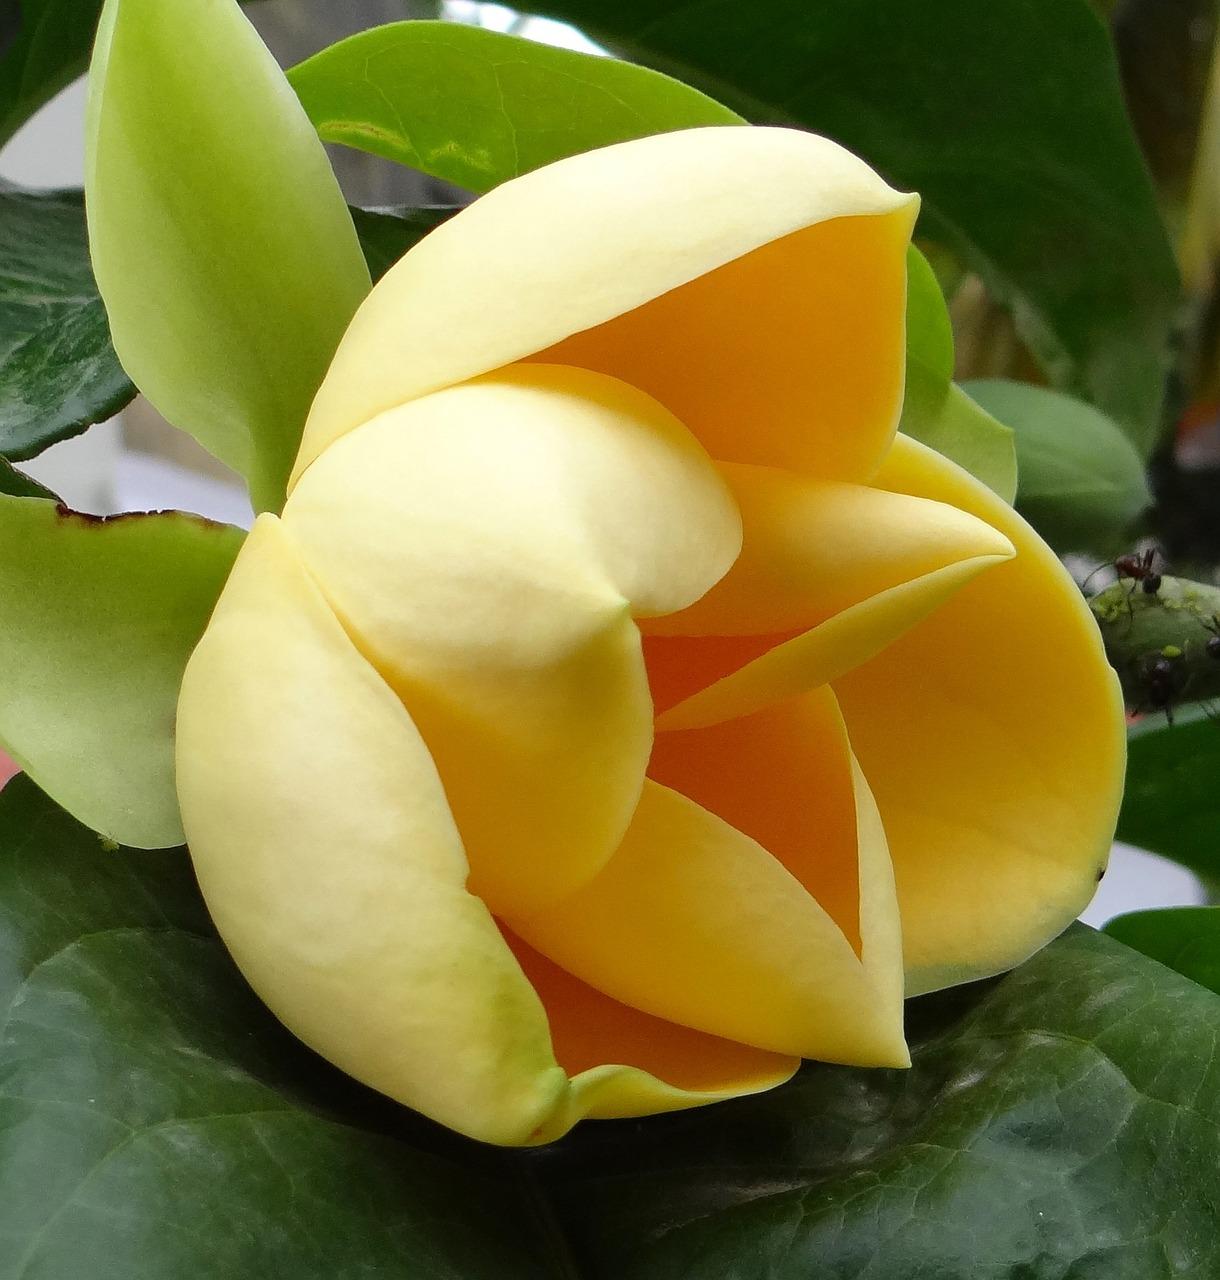 Egg Magnoliamagnolia Liliiferaflowertropicalbloom Free Photo